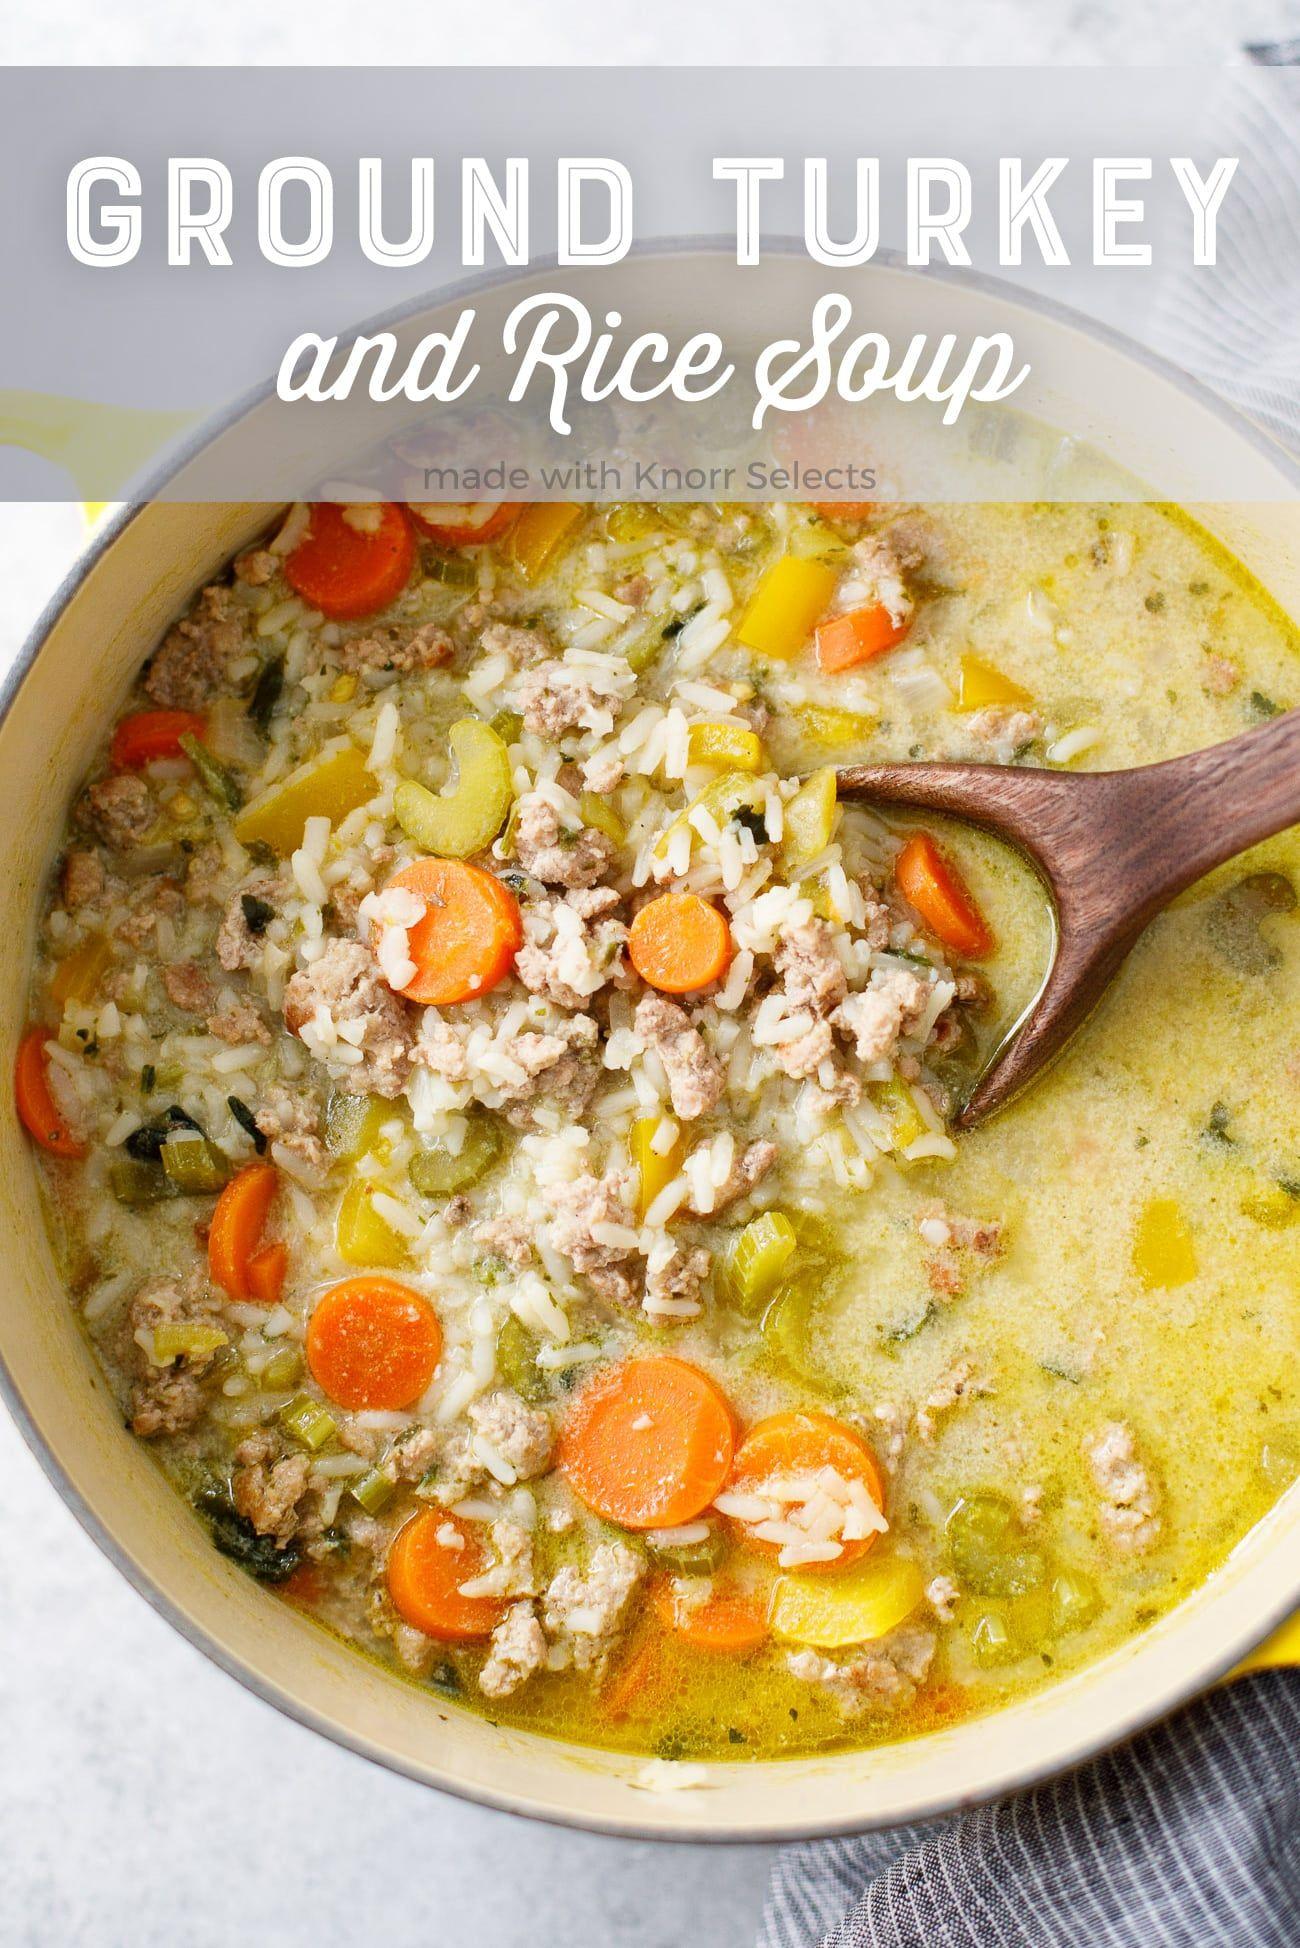 Ground Turkey and Rice Soup Recipe - Easy Ground Turkey Soup